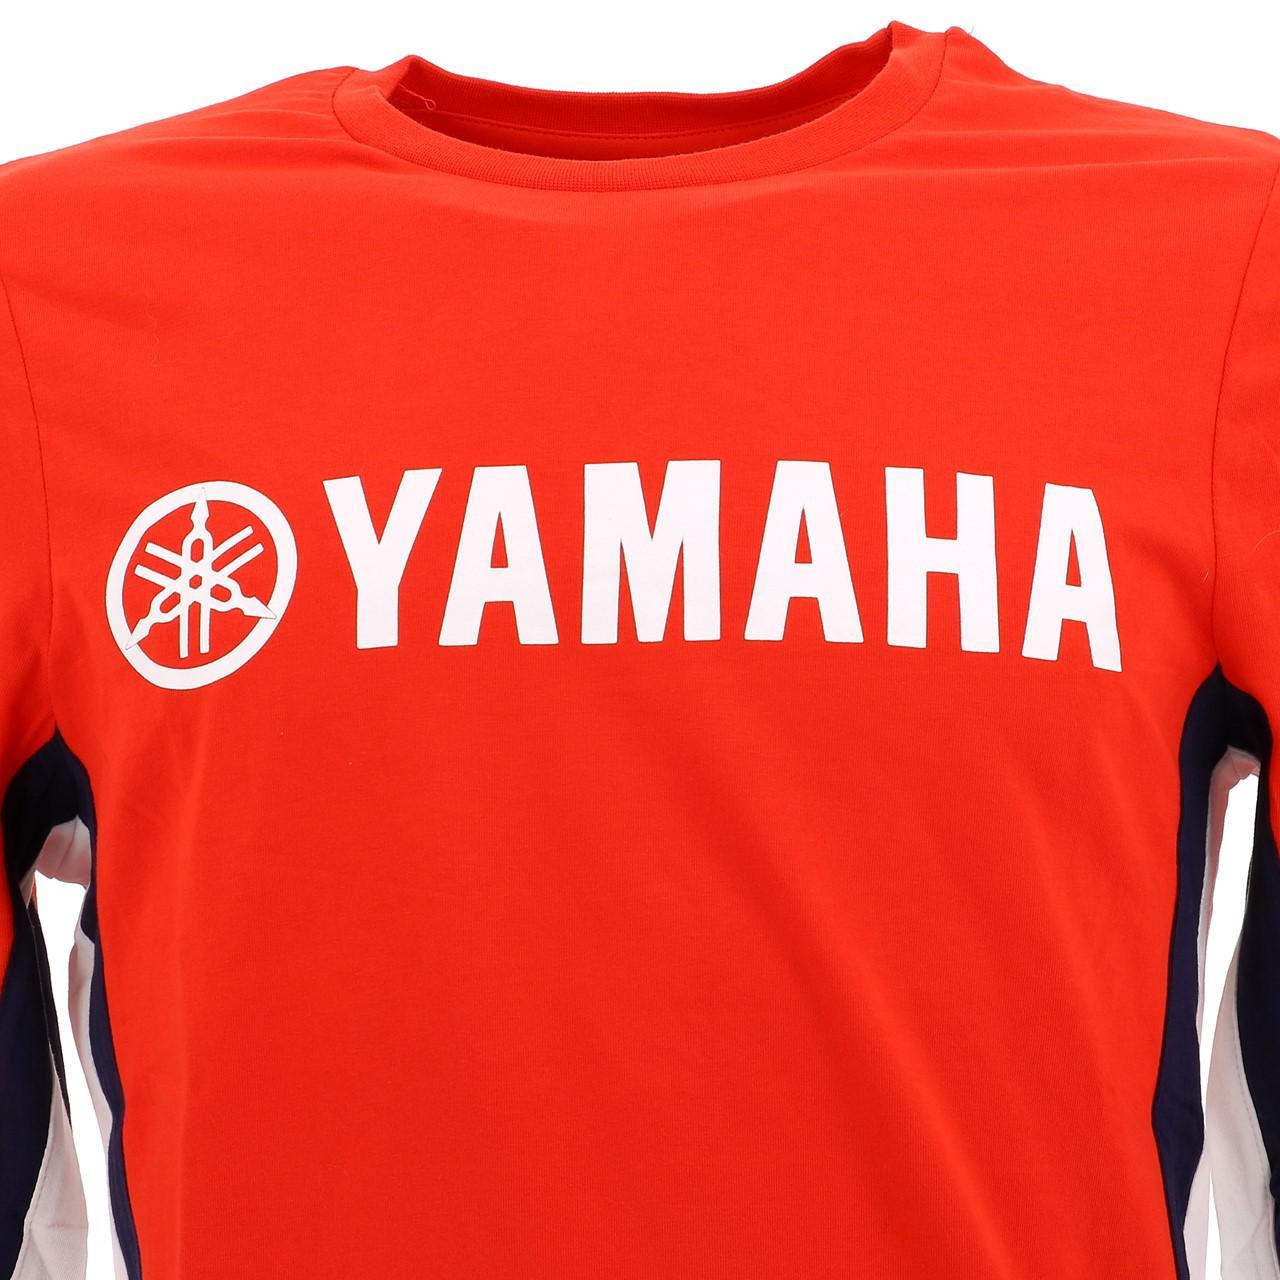 T-Shirt-Long-Sleeves-Yamaha-Yam-C-Red-ML-Tee-Red-28650-New